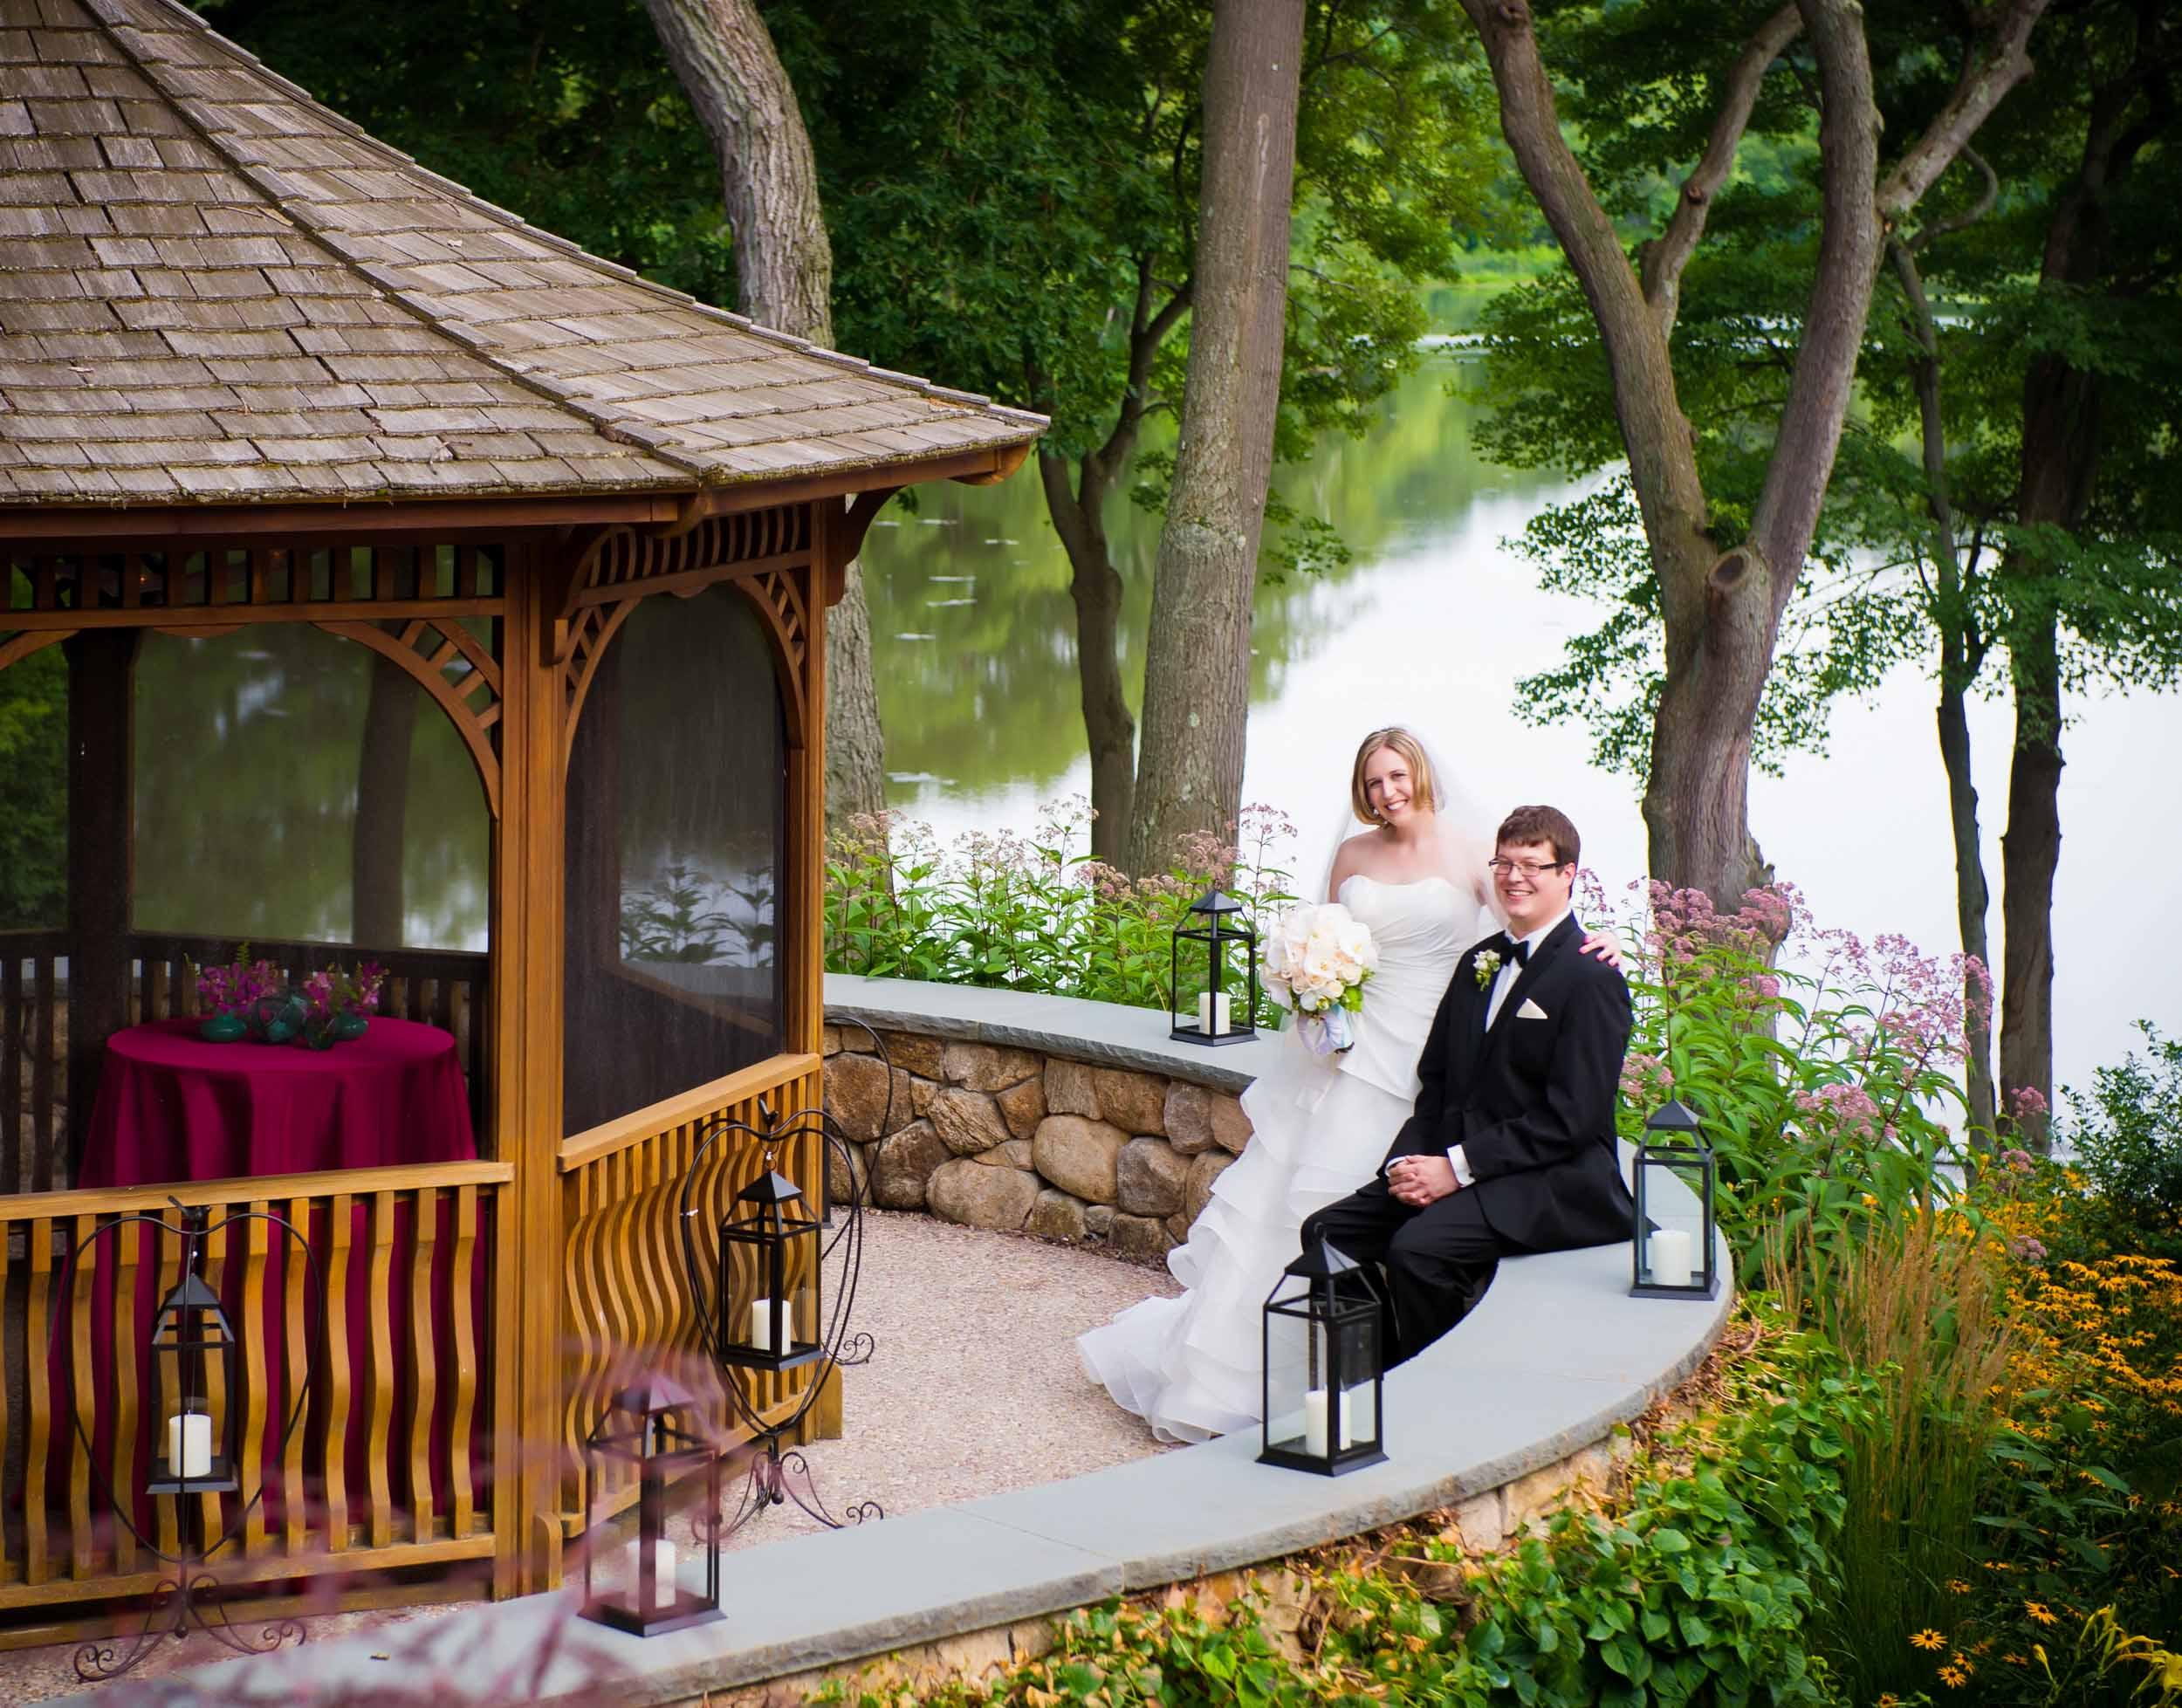 Wedding45KateTim 002*2-Edit-2.jpg